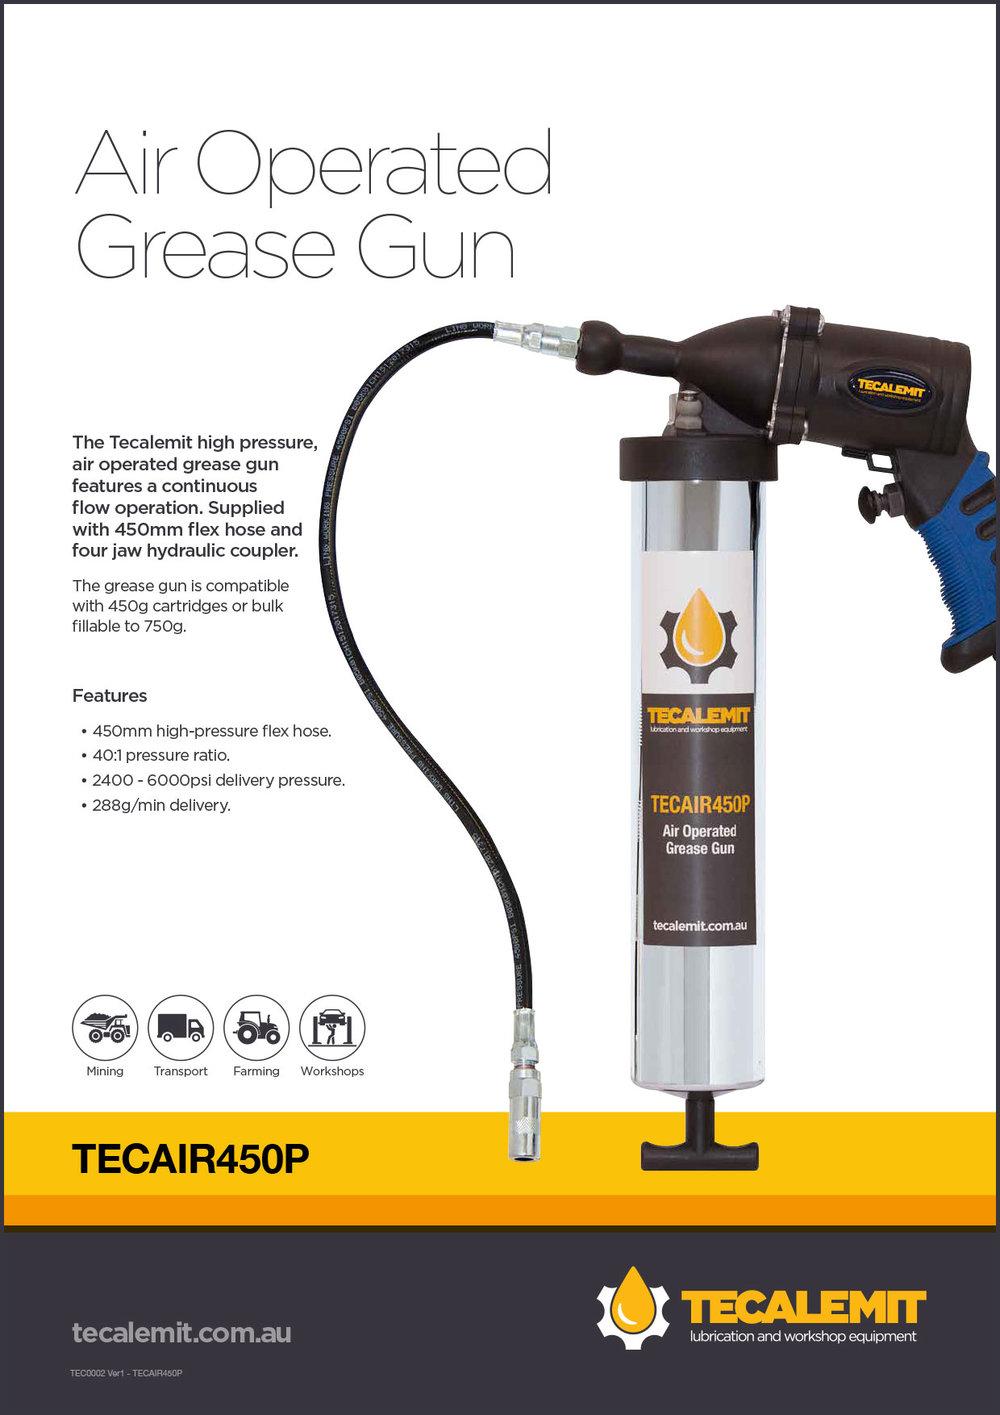 TECAIR450P Product Info